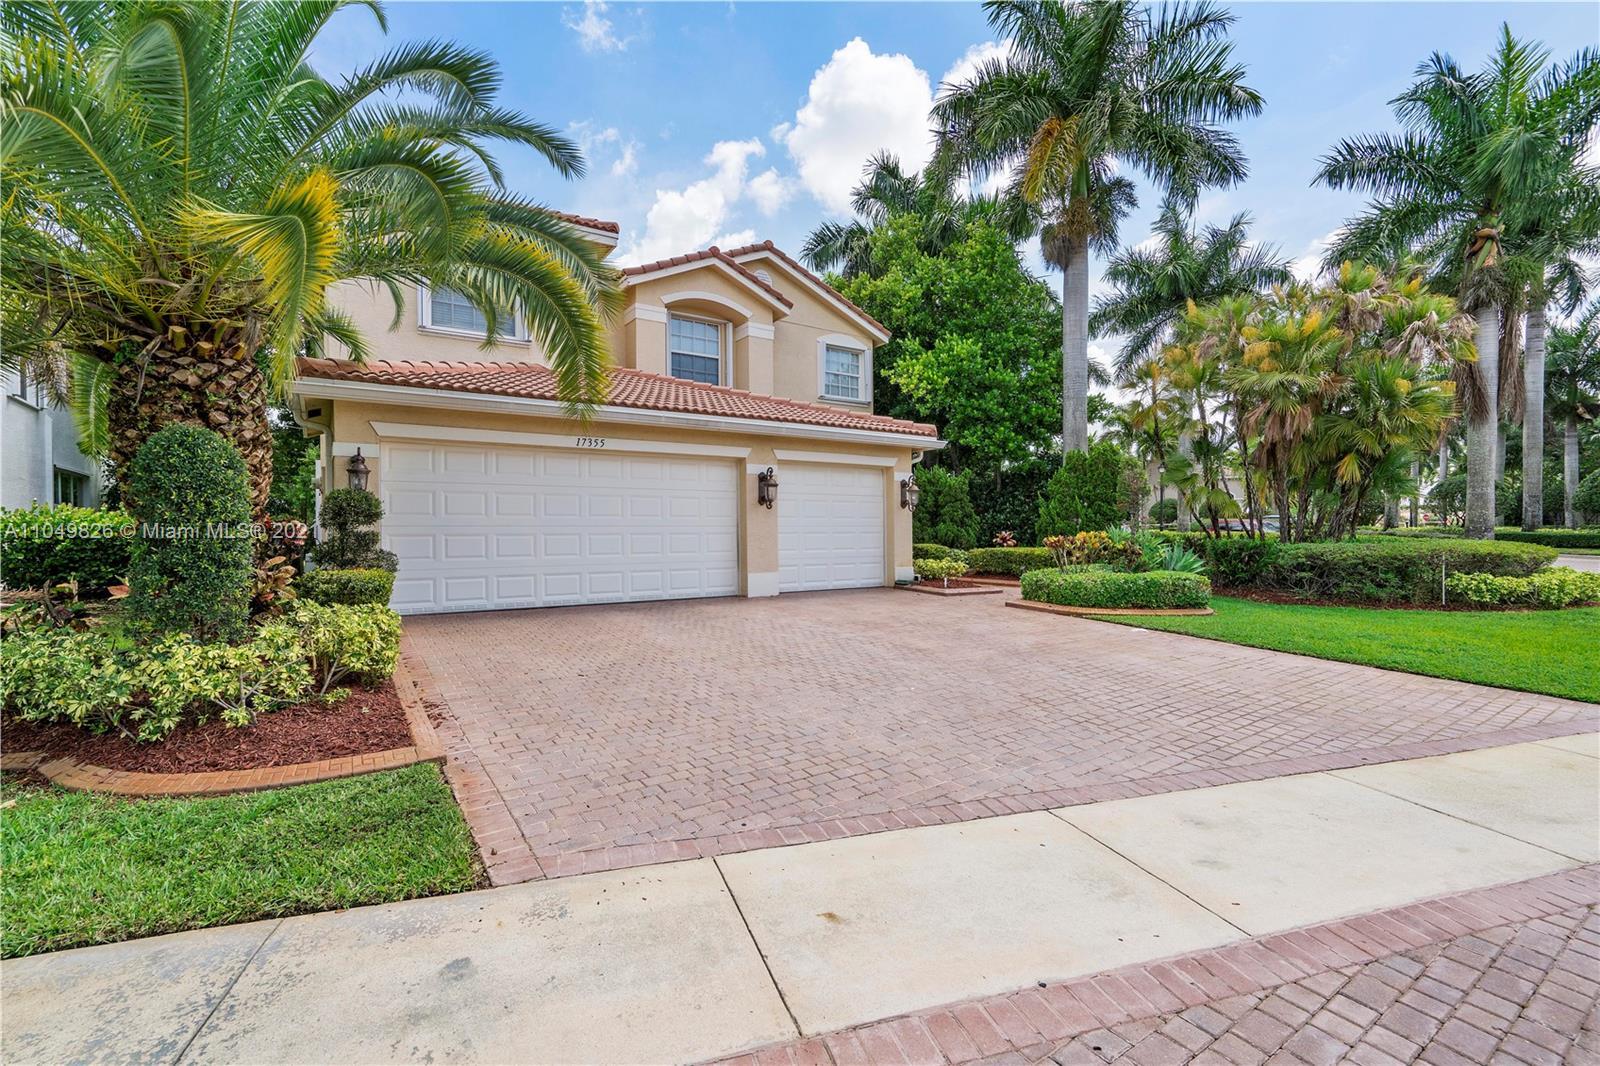 17355 48th St, Miramar, Florida 33029